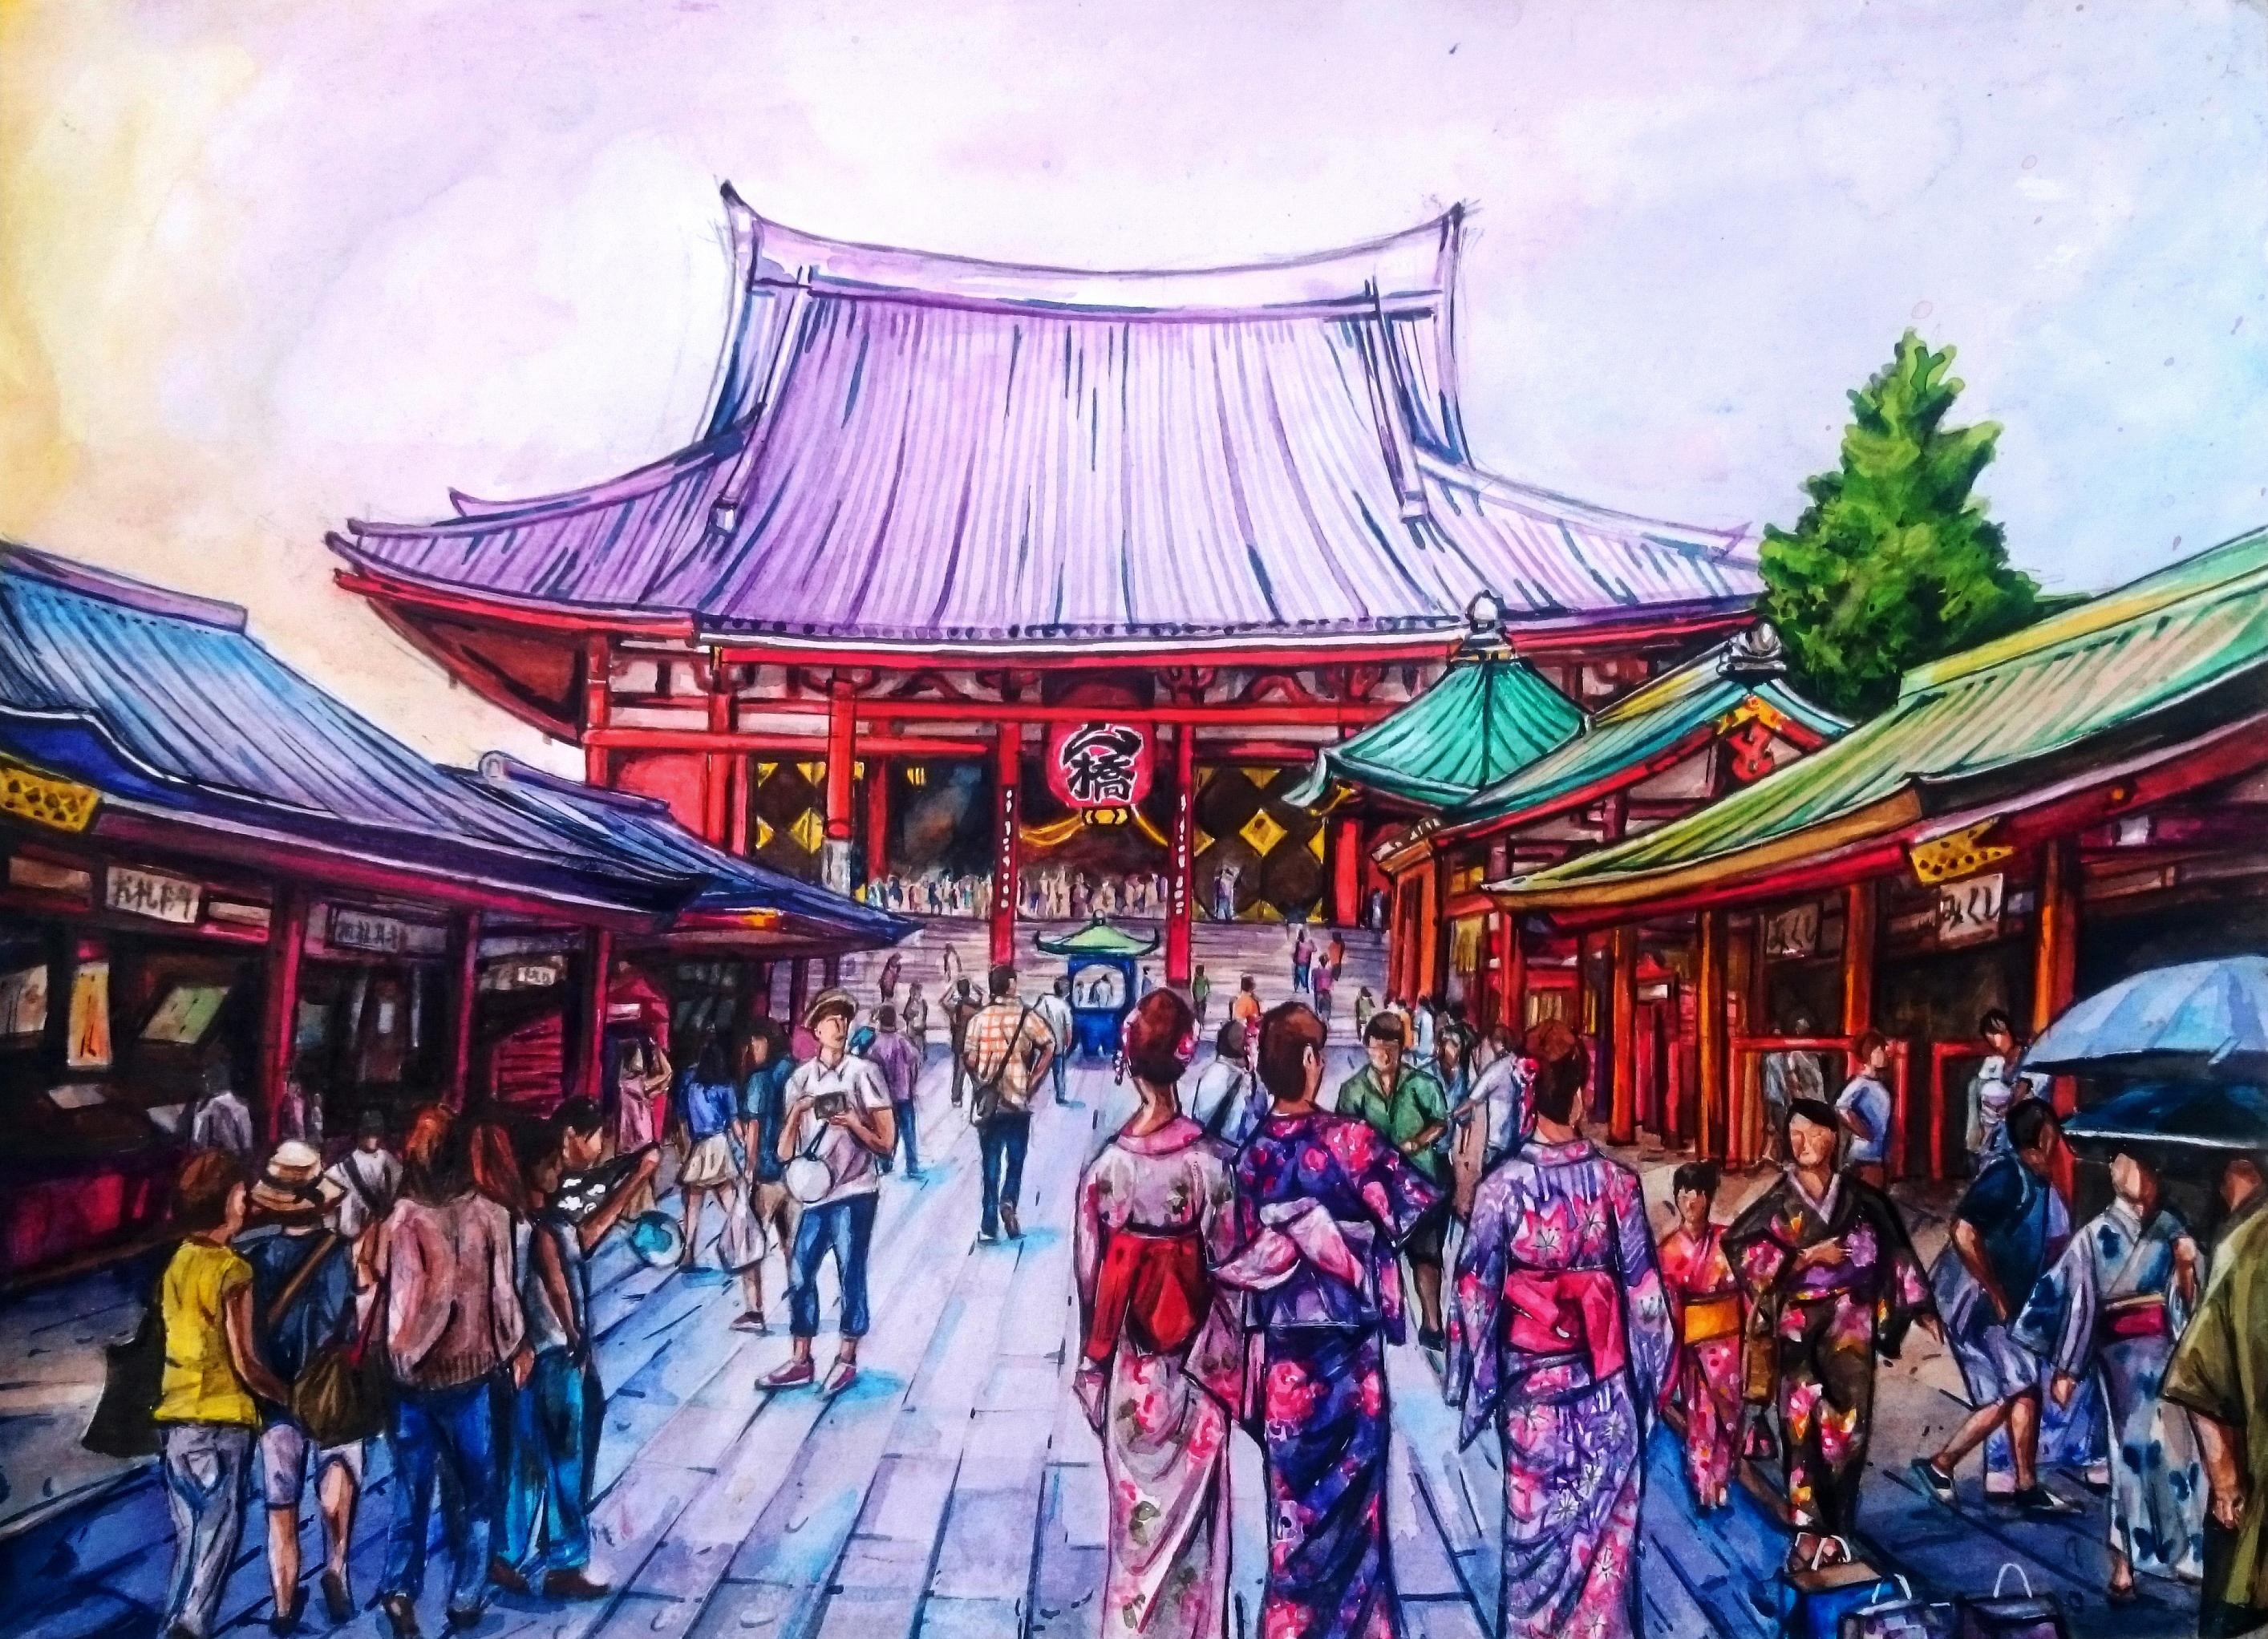 Three Maidens - Sensoji Temple by BreakfastTears